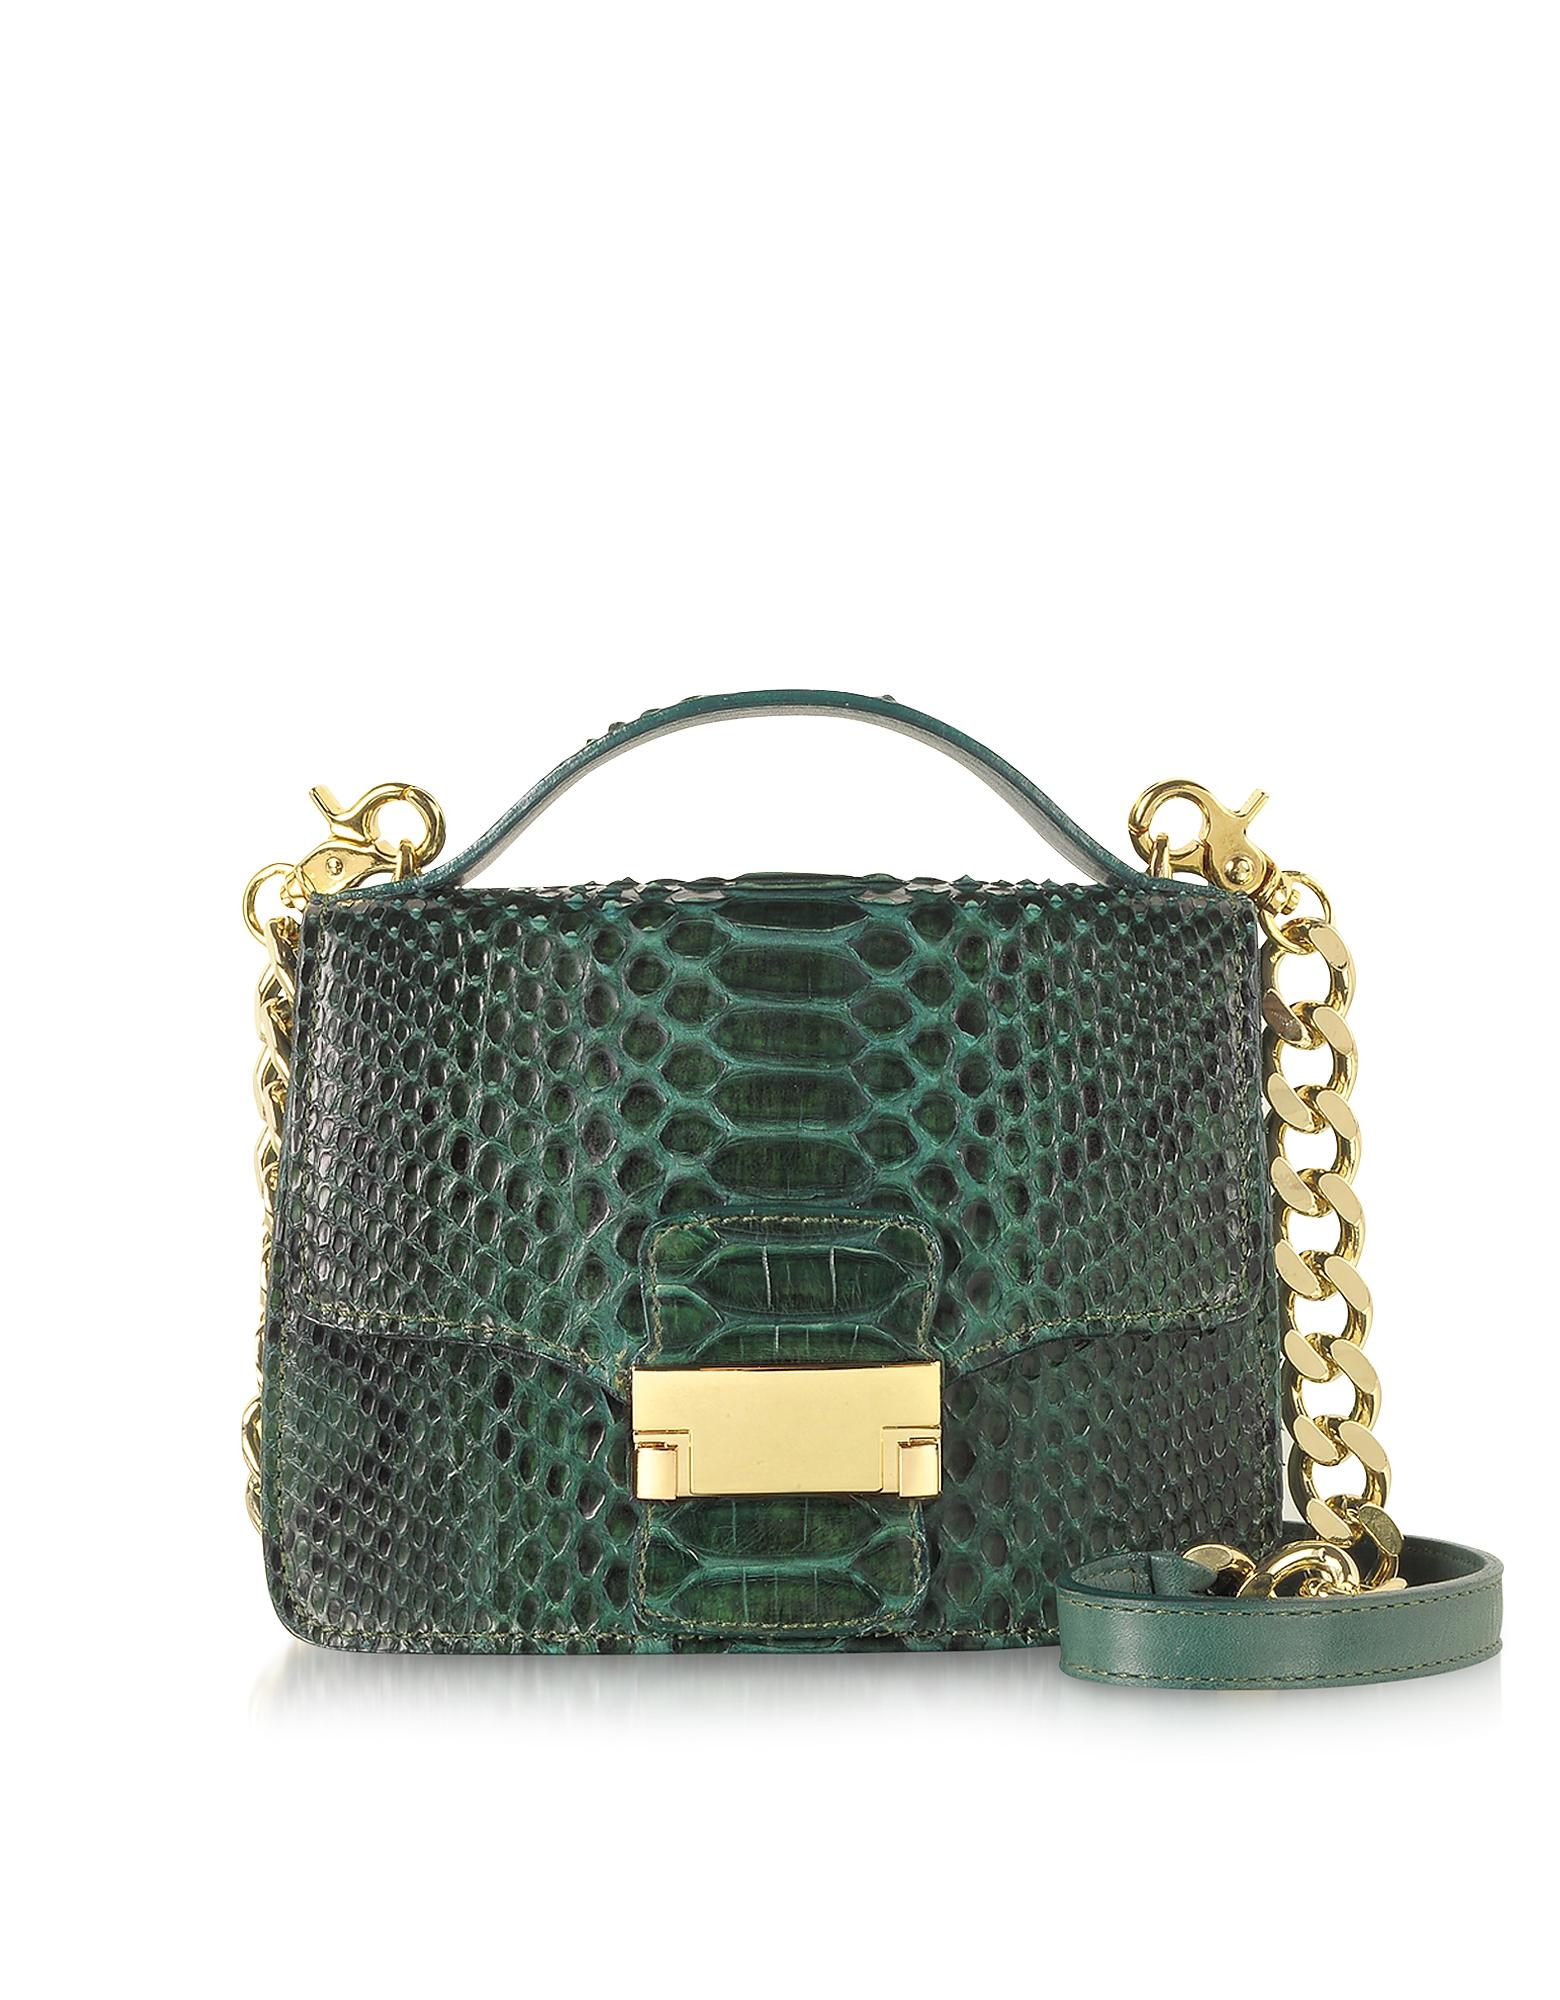 Ghibli - Emerald Green Python Leather Shoulder Bag